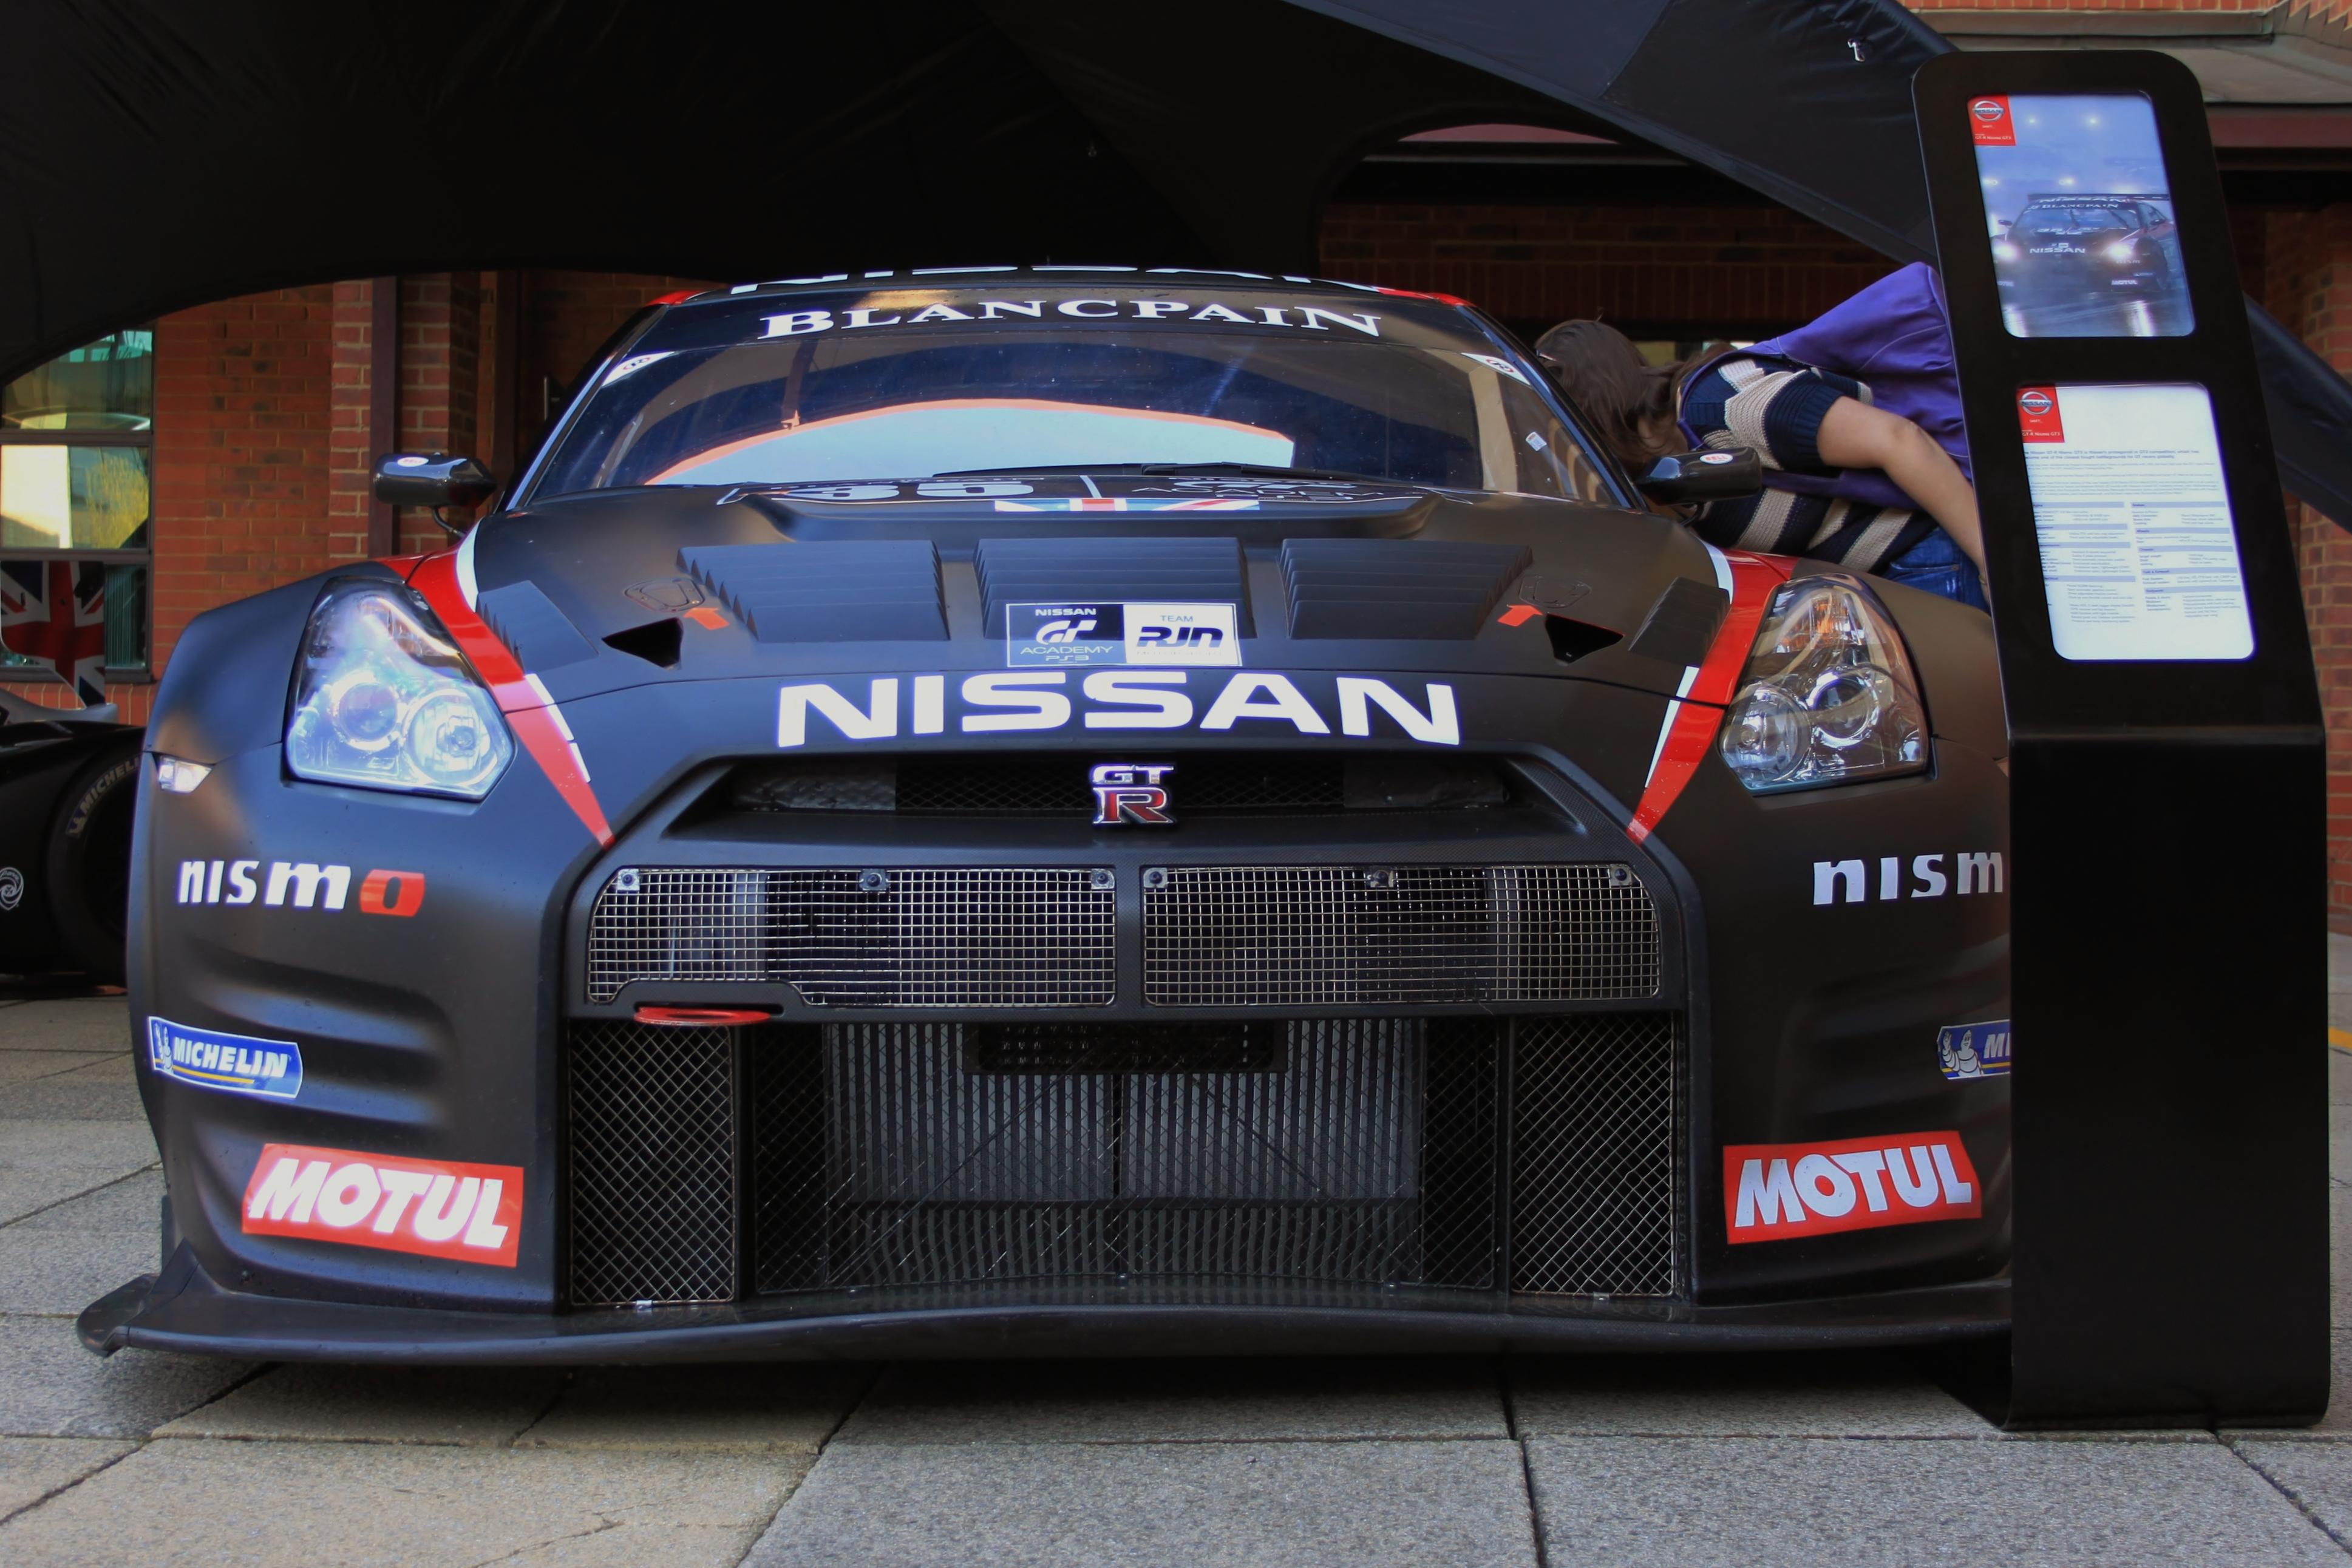 Nissan GTR GT3 2012 Front low